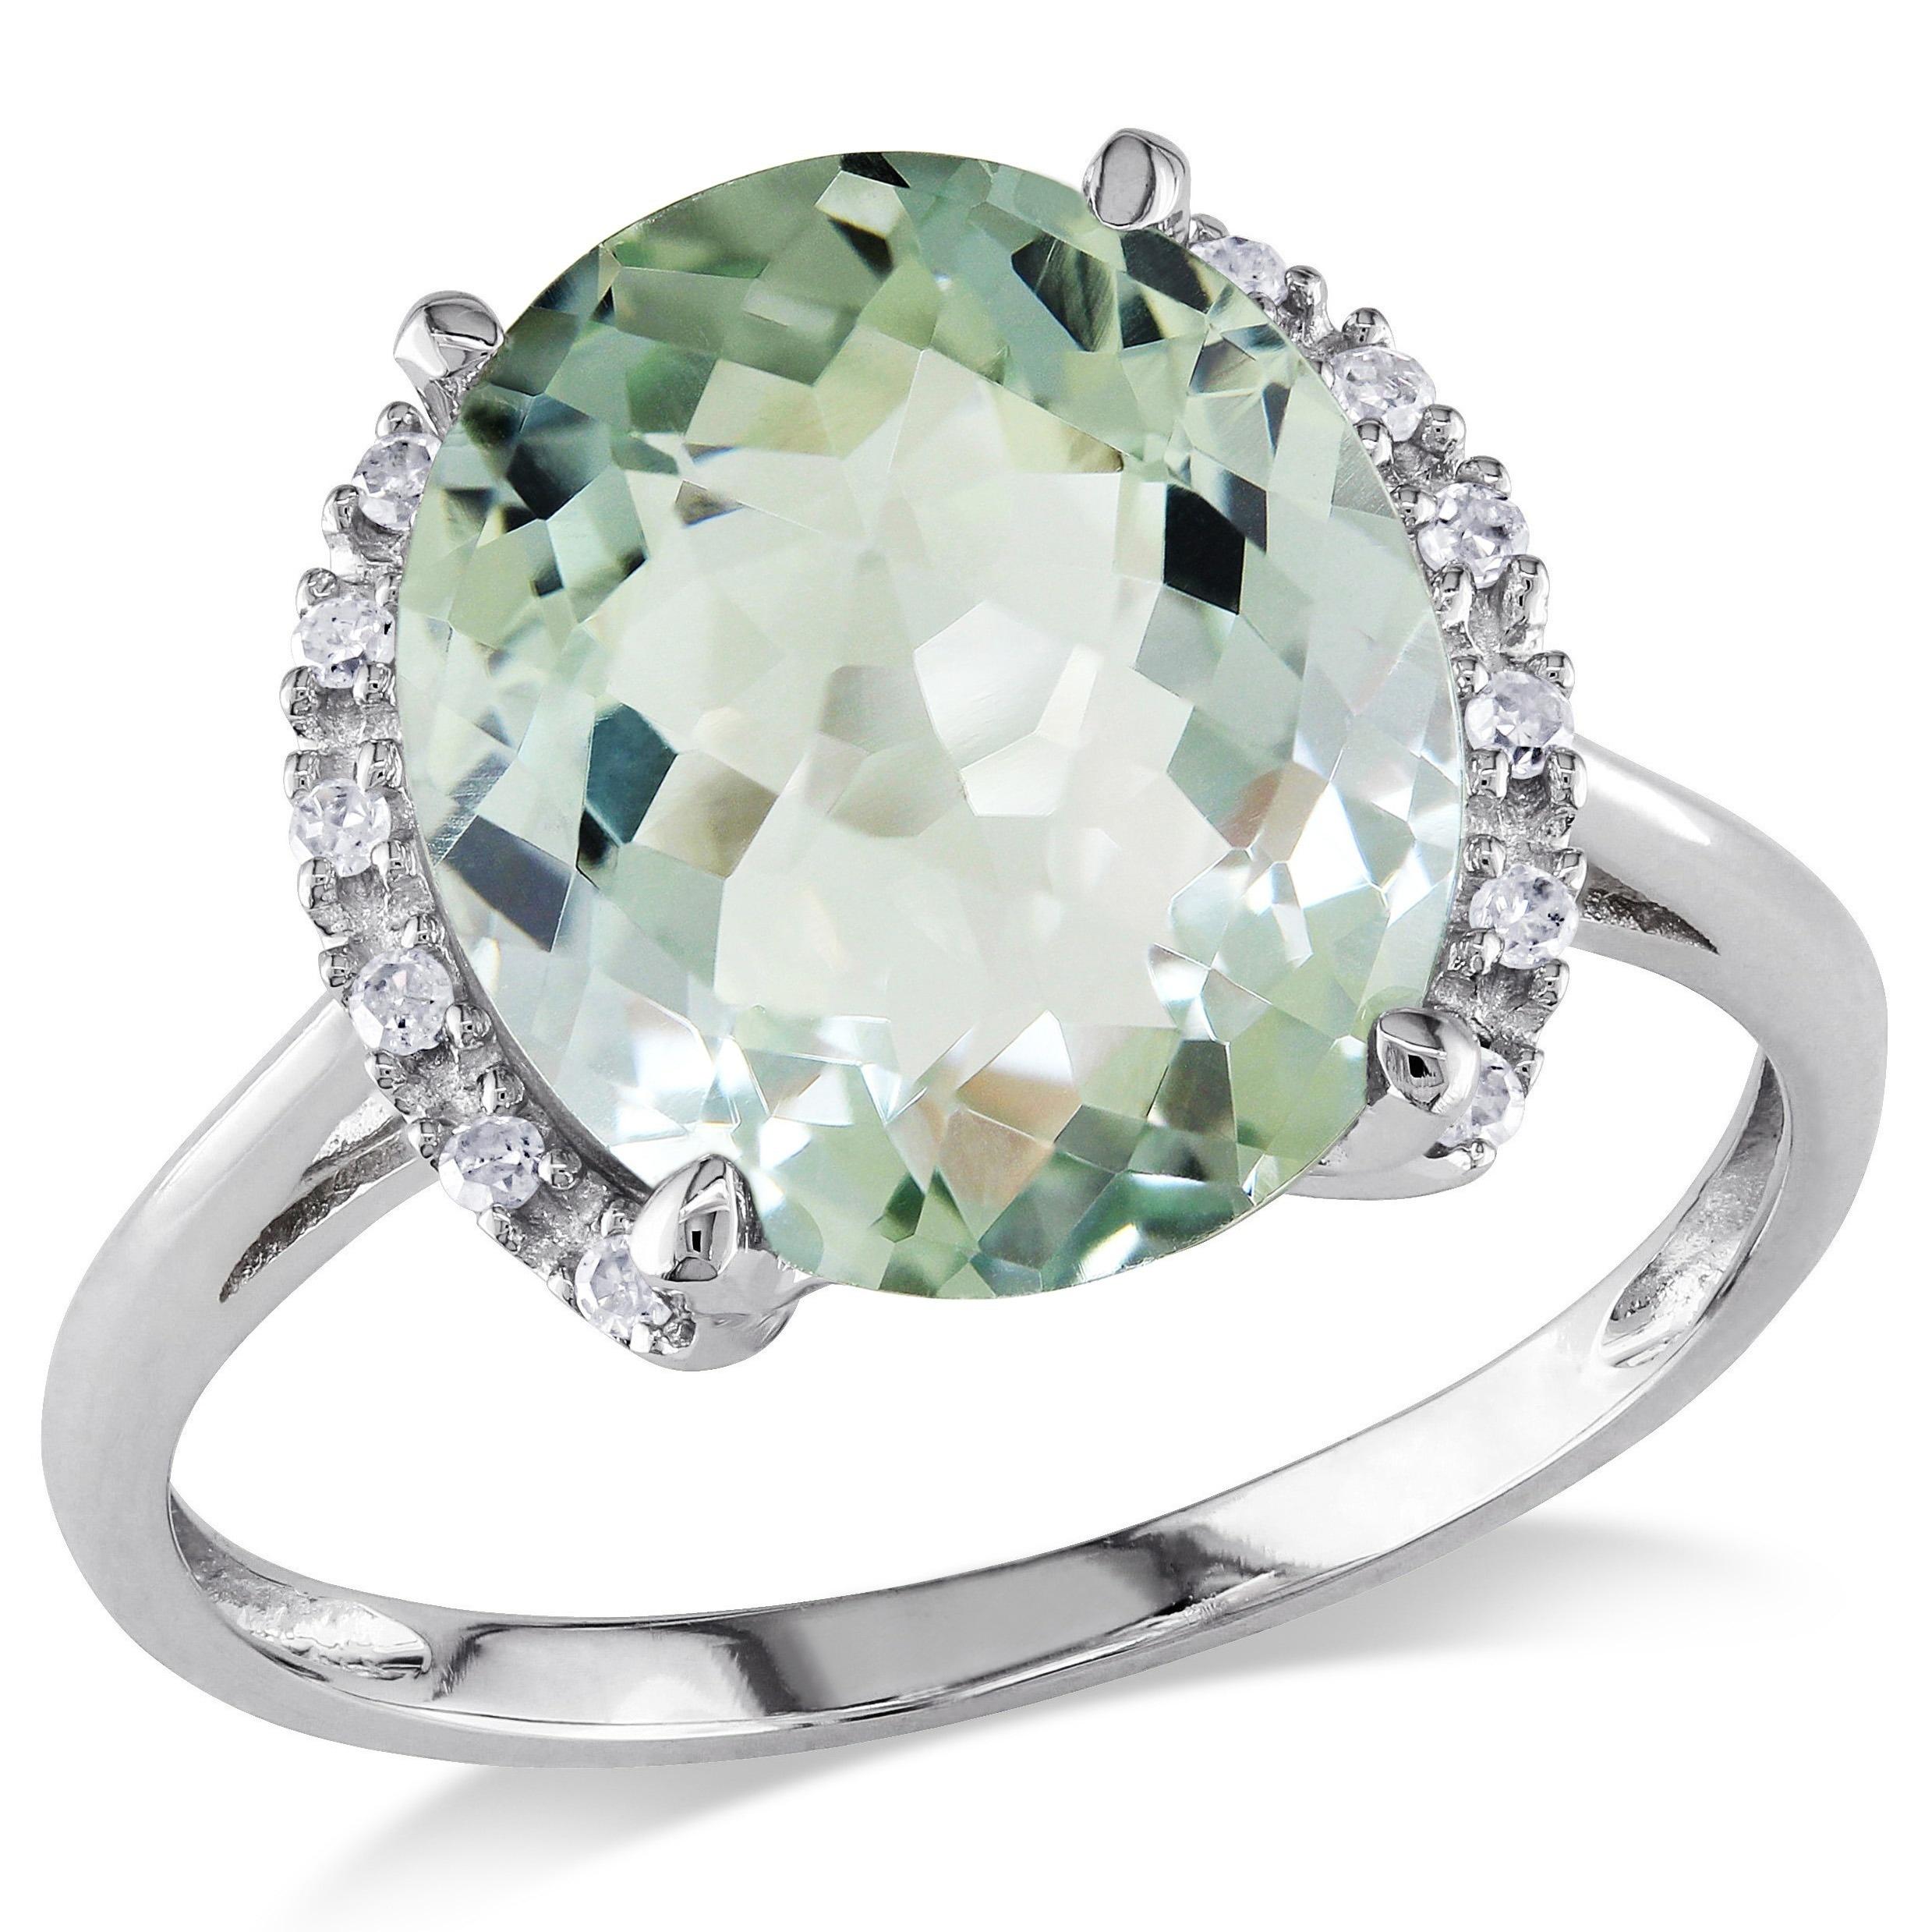 miadora 10k gold green amethyst and diamond ring 7 ebay. Black Bedroom Furniture Sets. Home Design Ideas